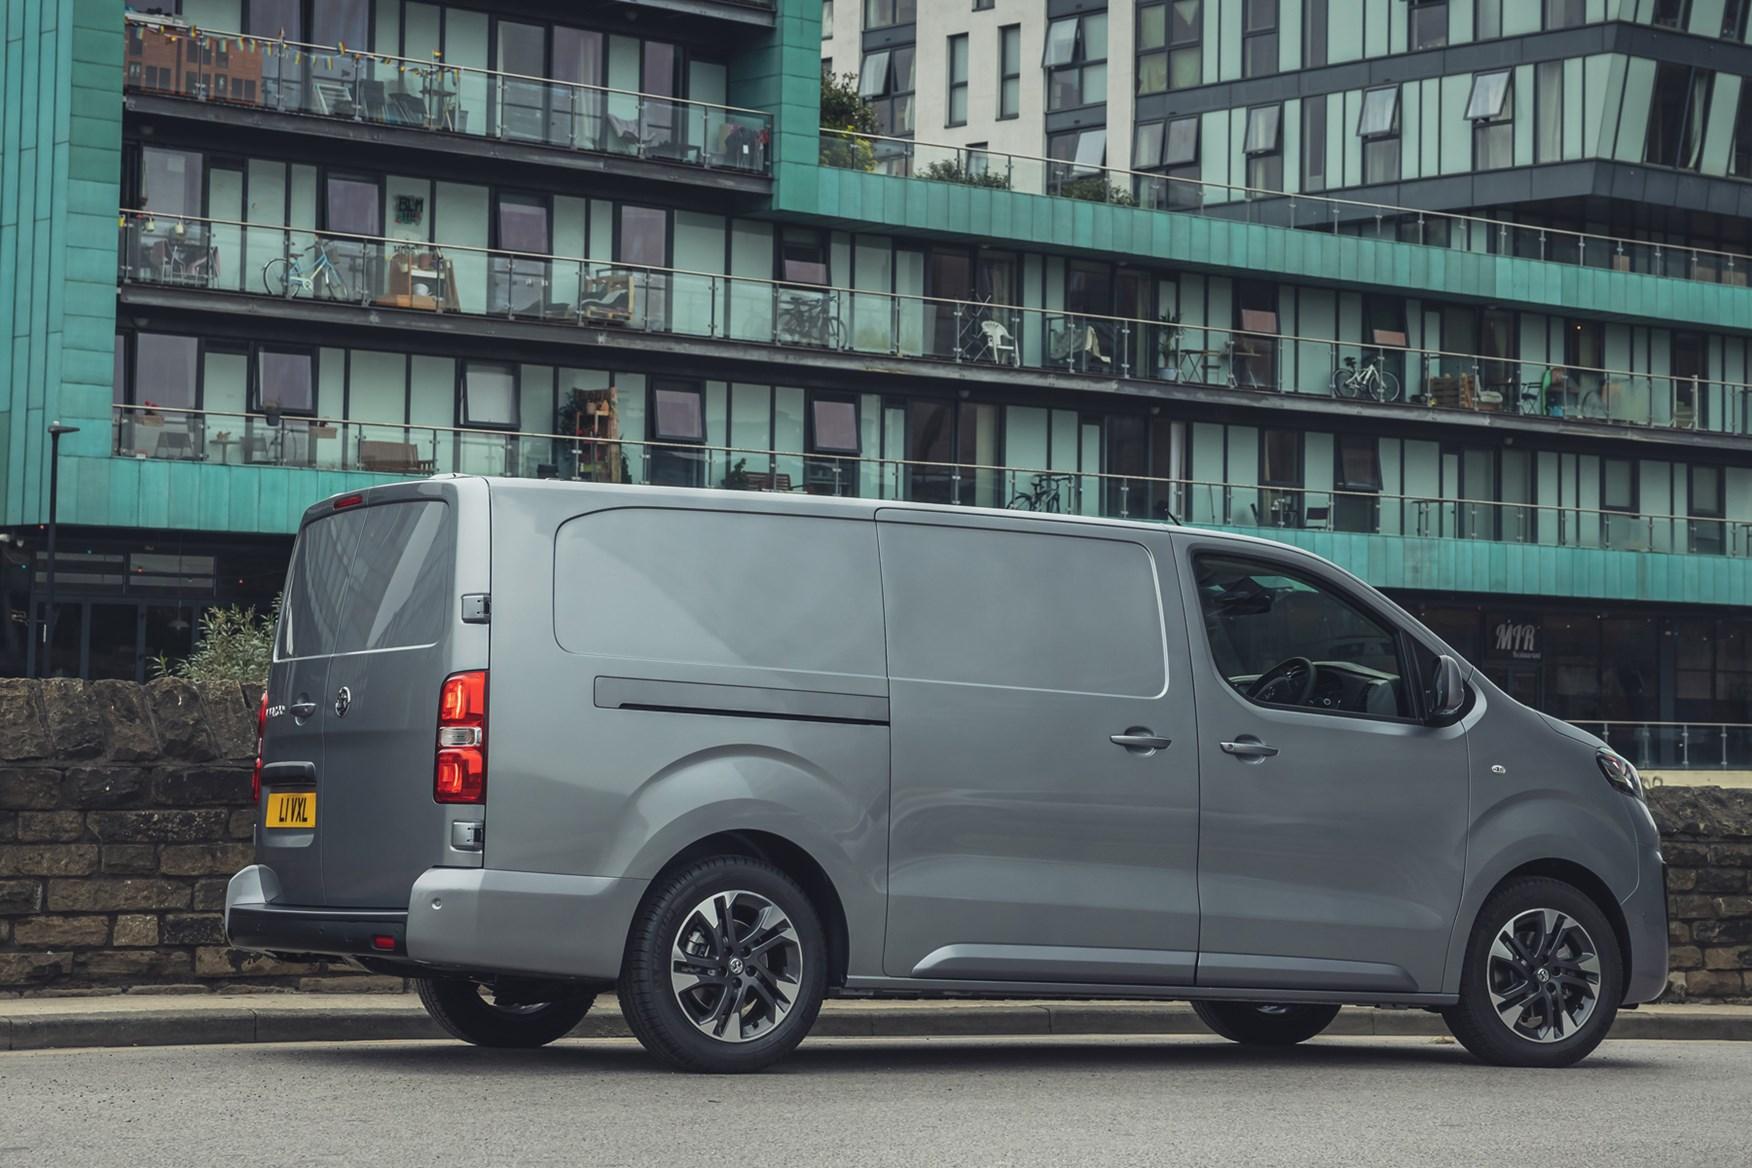 Vauxhall Vivaro-e review, 2020, electric van, rear view, grey